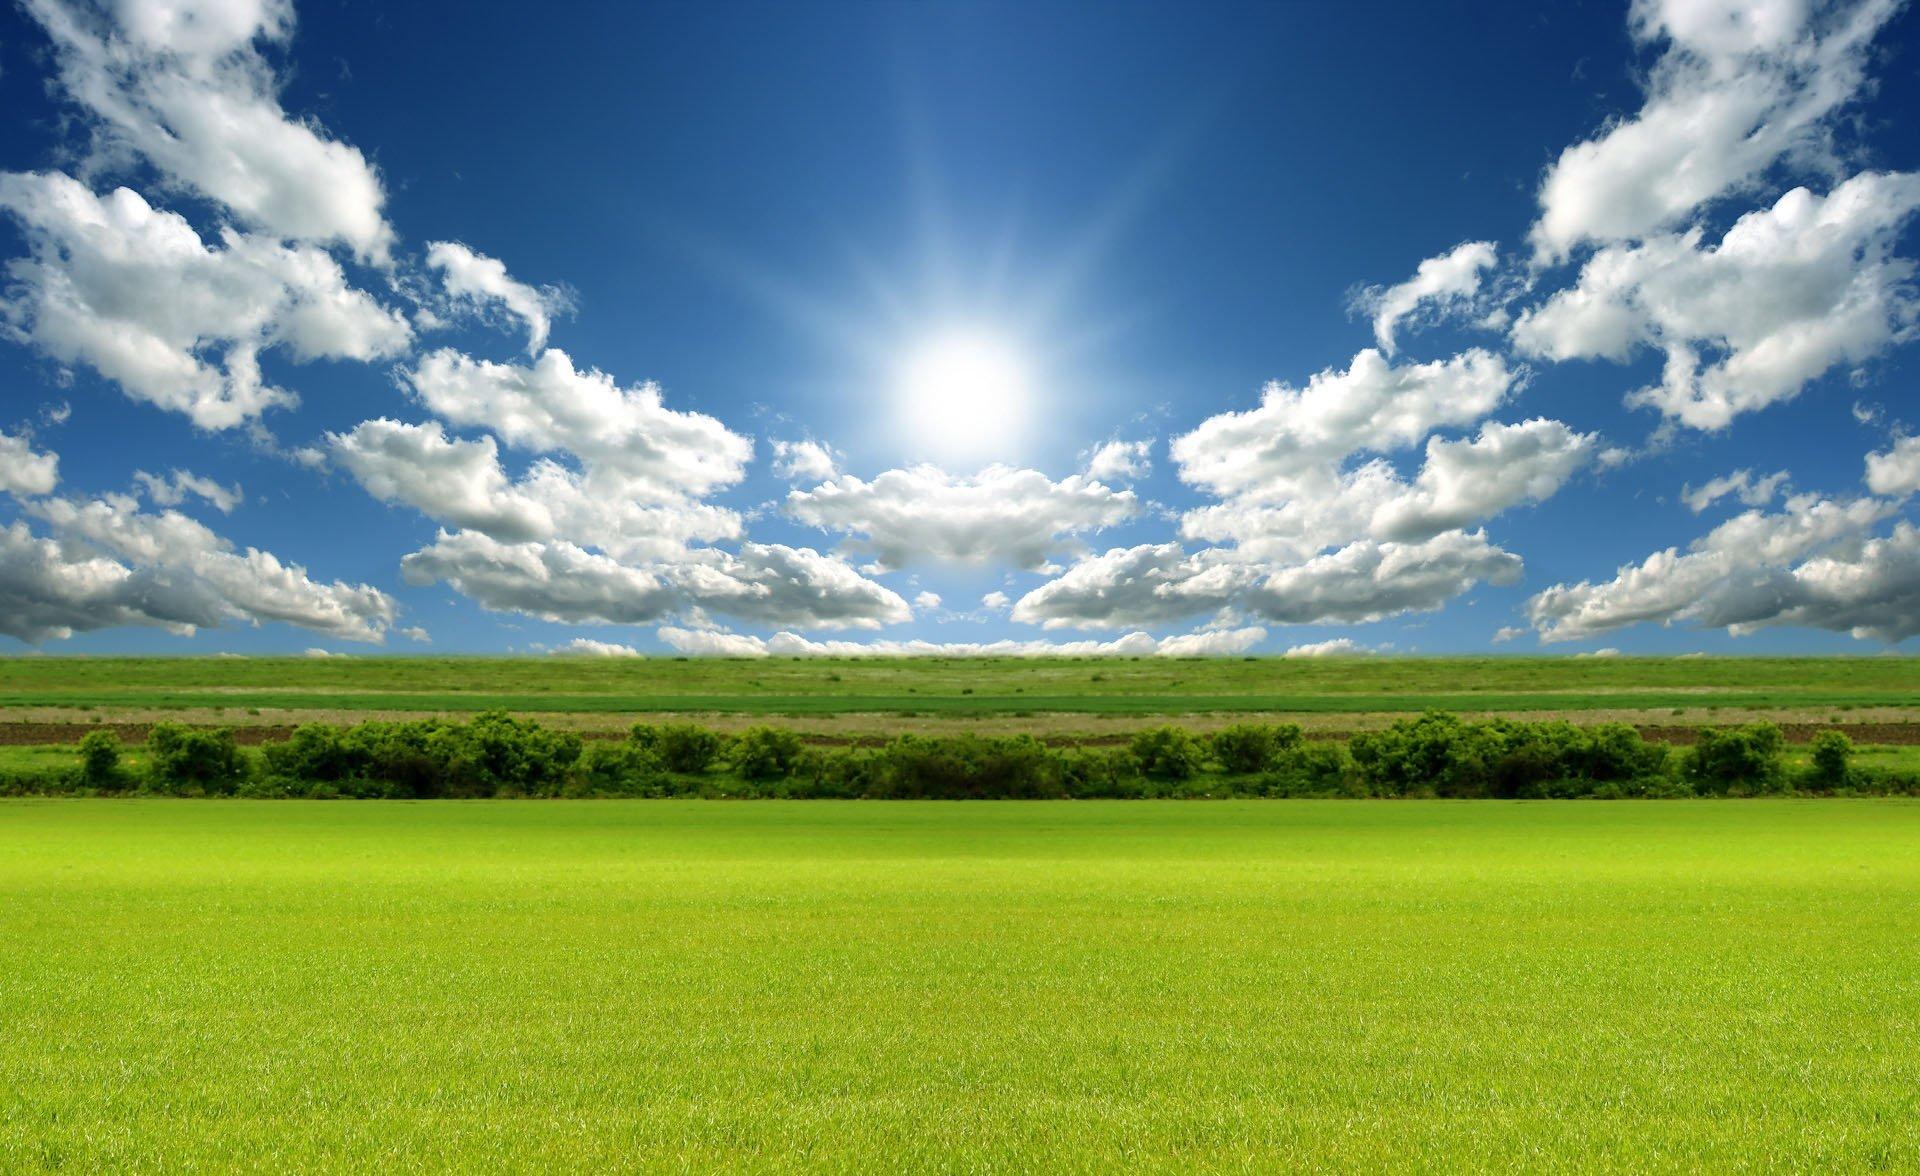 sun nature image